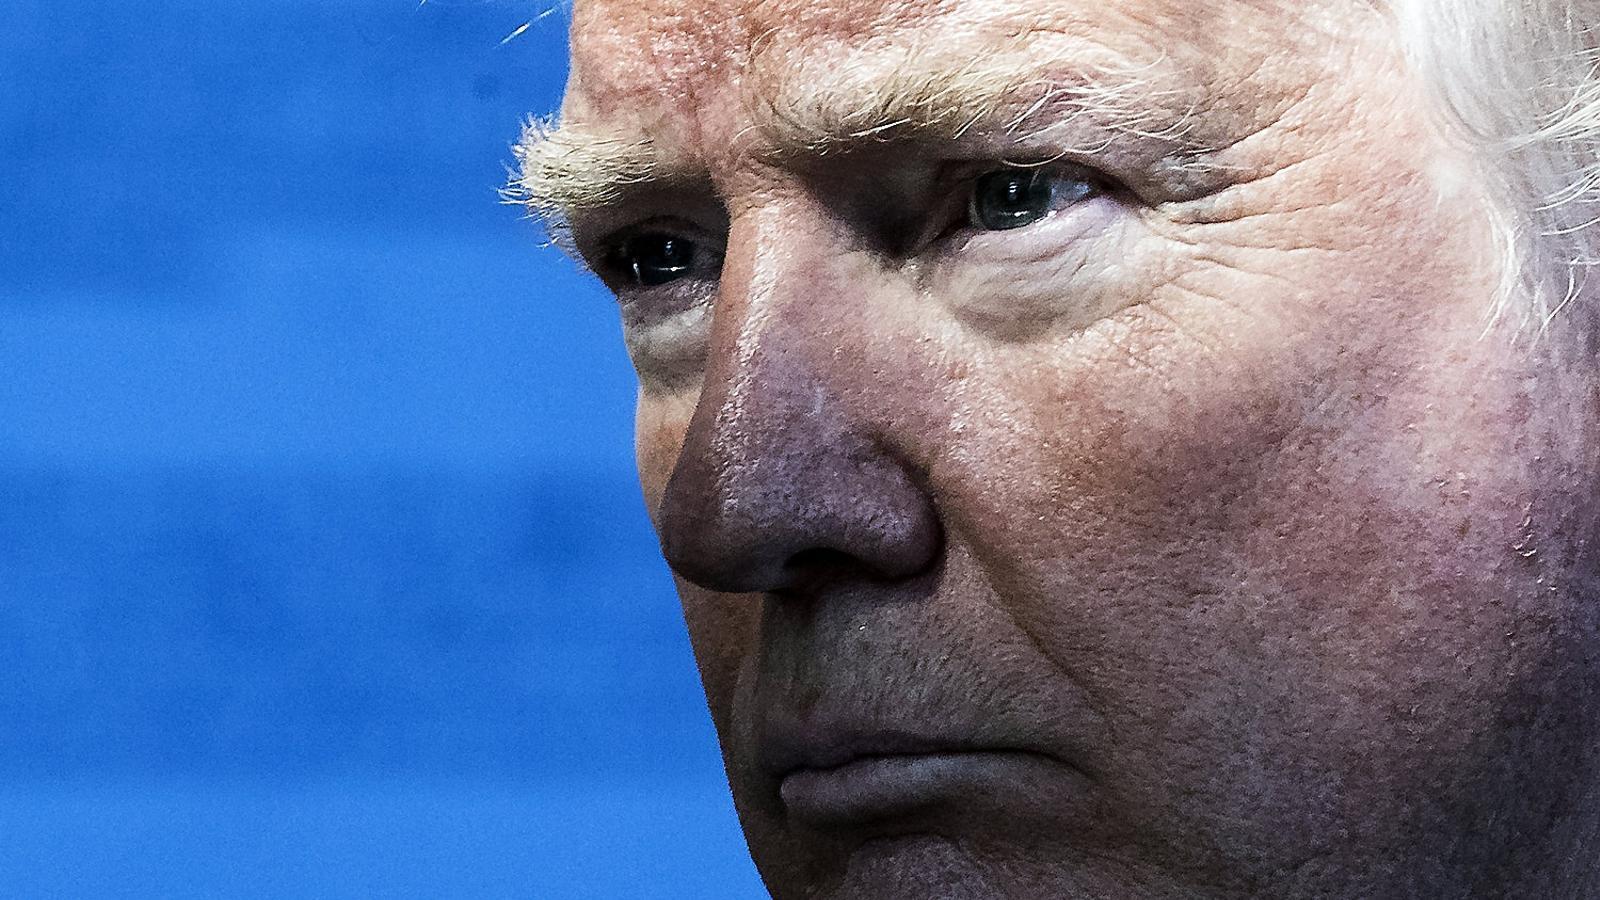 Trump trepitja el planeta Terra